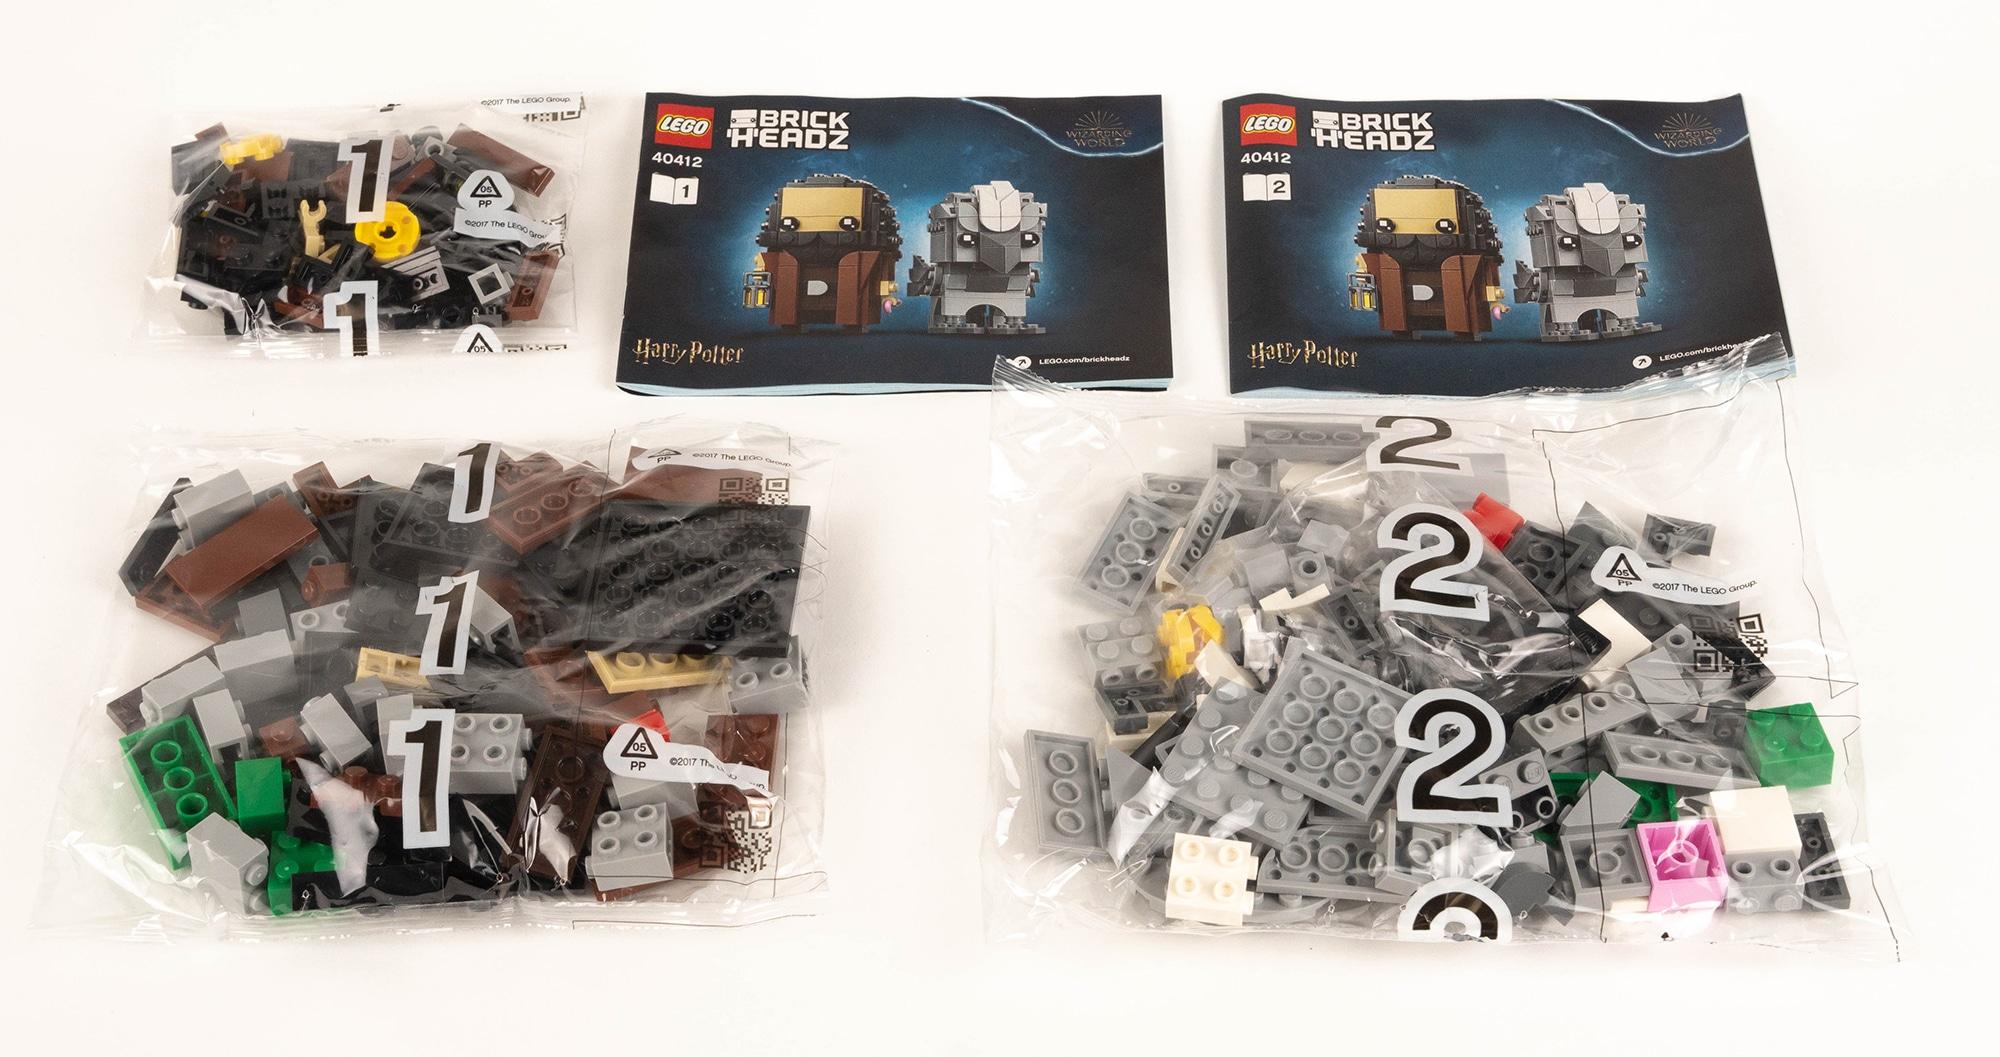 LEGO 40412 Hagrid Seidenschnabel Brickheadz Review 3